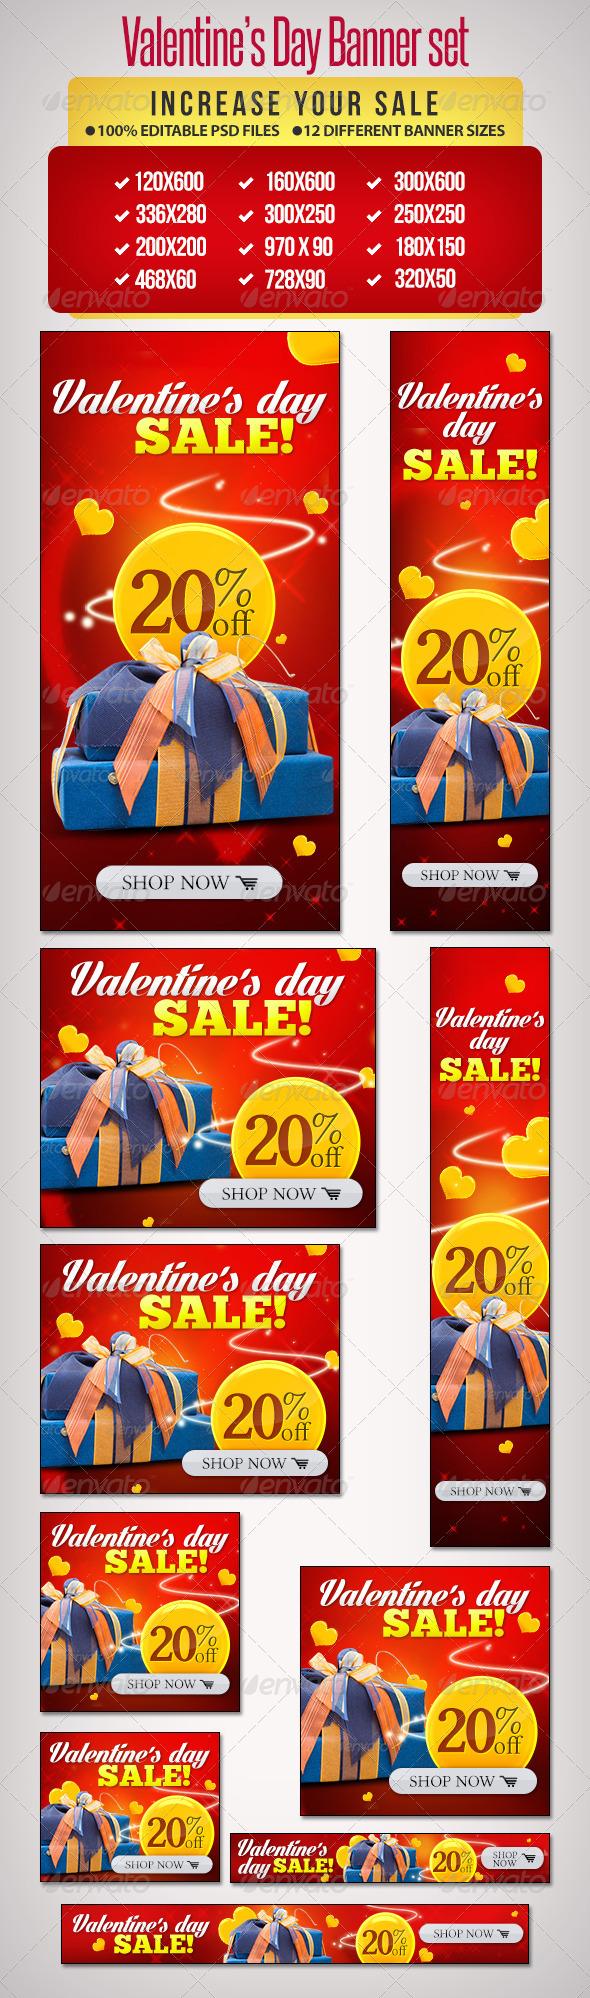 GraphicRiver Valentine s Day Banner Set 8 6607823